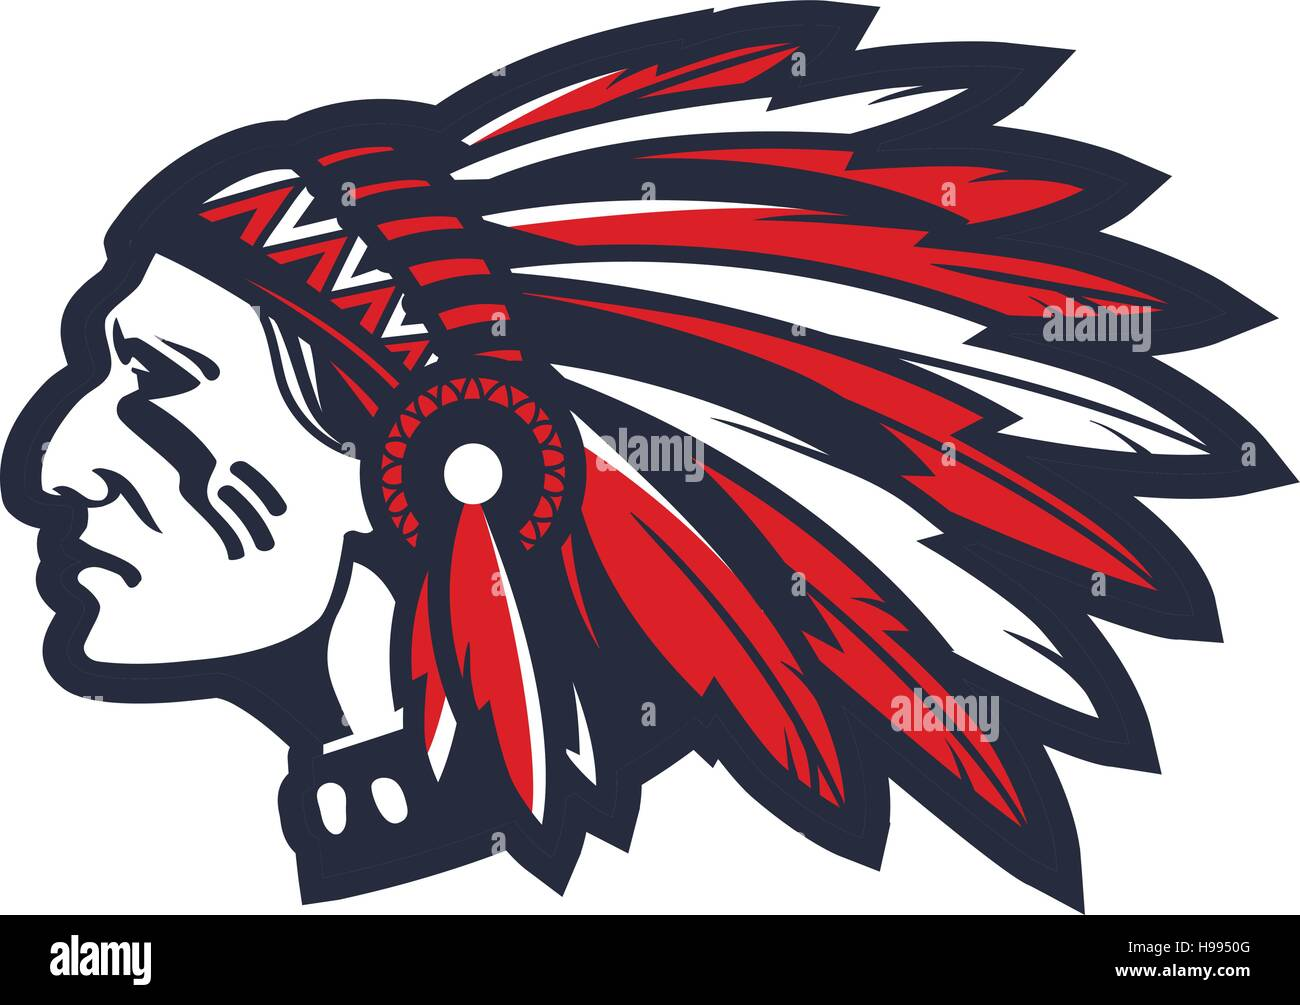 american indian chief vector logo or icon stock vector art indian chief logo 1903 indian chief logan